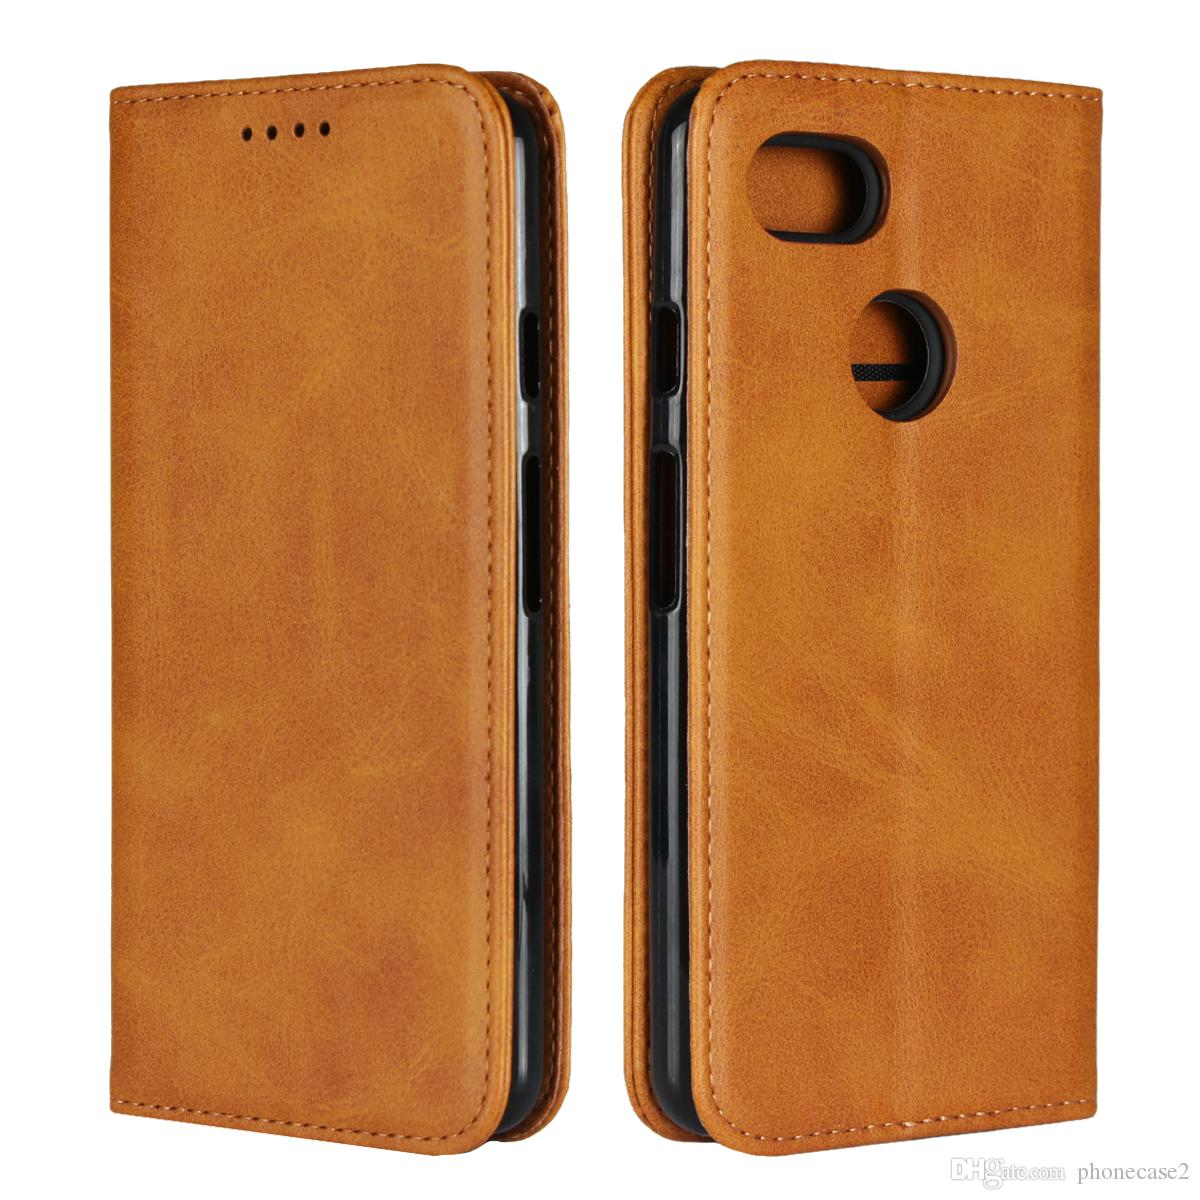 100% authentic b2c74 20de1 DNGN Wallet Case For Google Pixel 3 3 in 1 Magnetic Detachable Leather Case  For Google Pixel 3 Wallet Flip Stand Case